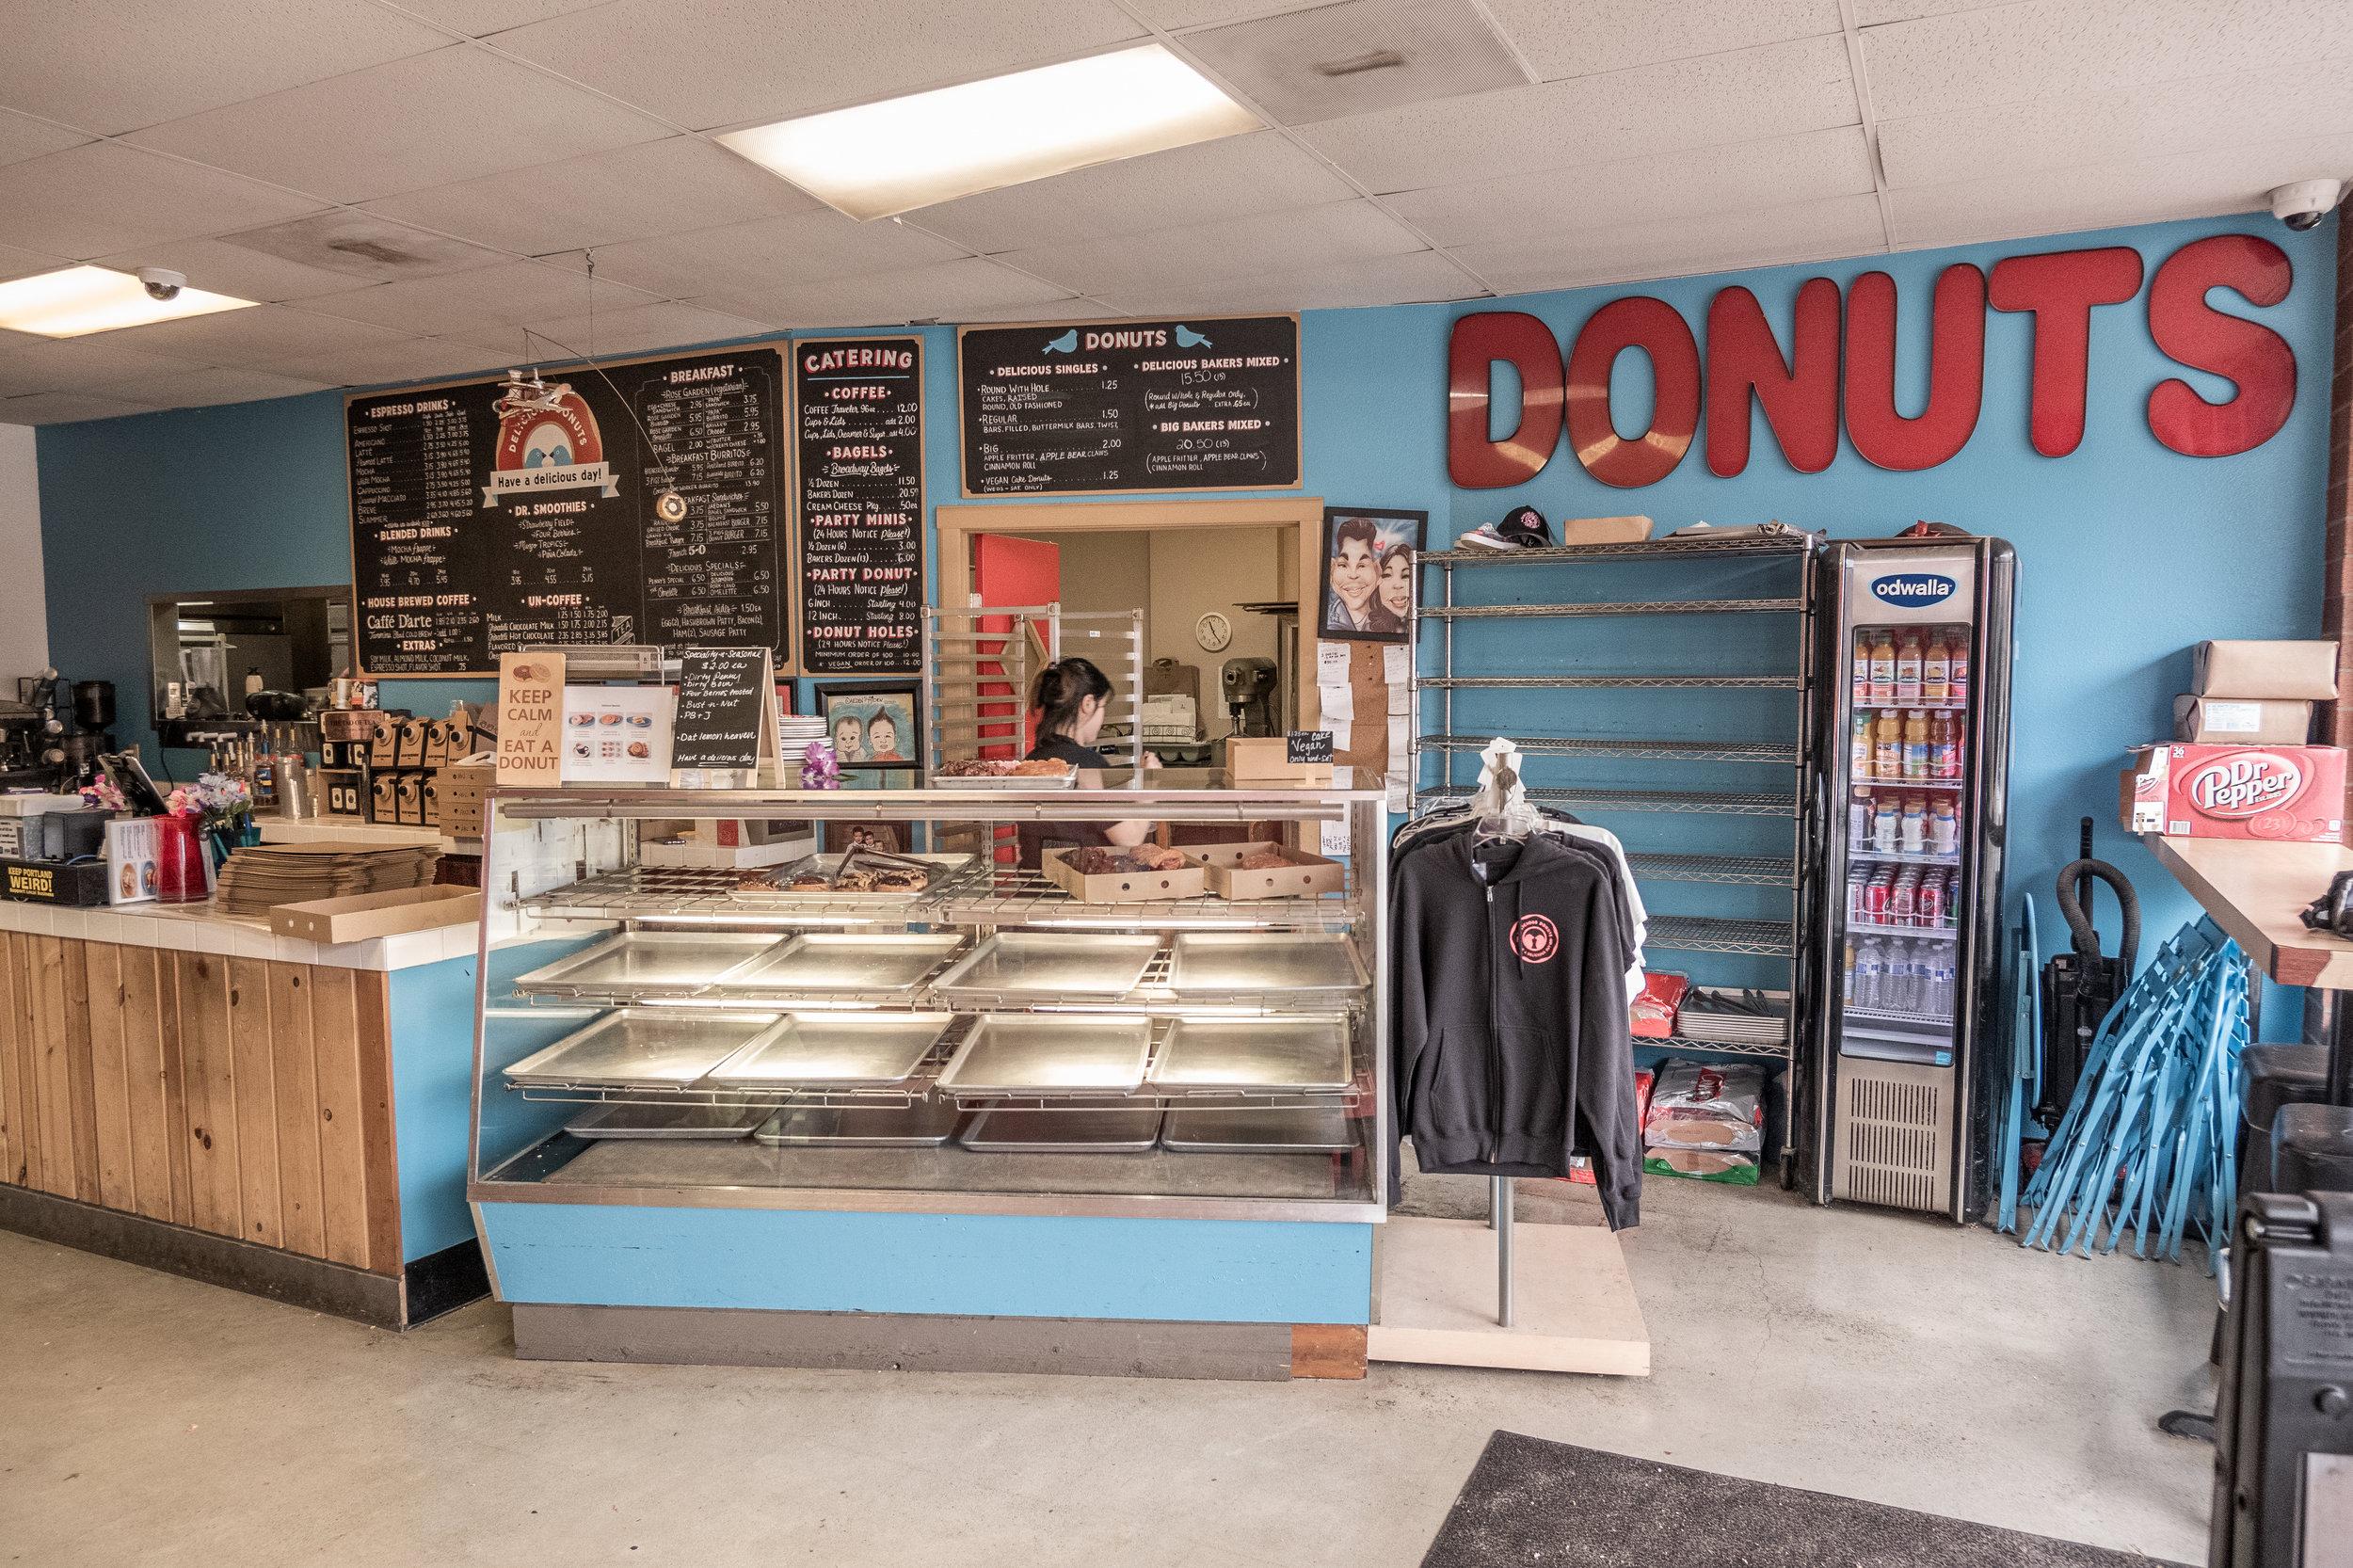 Delicious Donuts - Nathaniel Barber blog